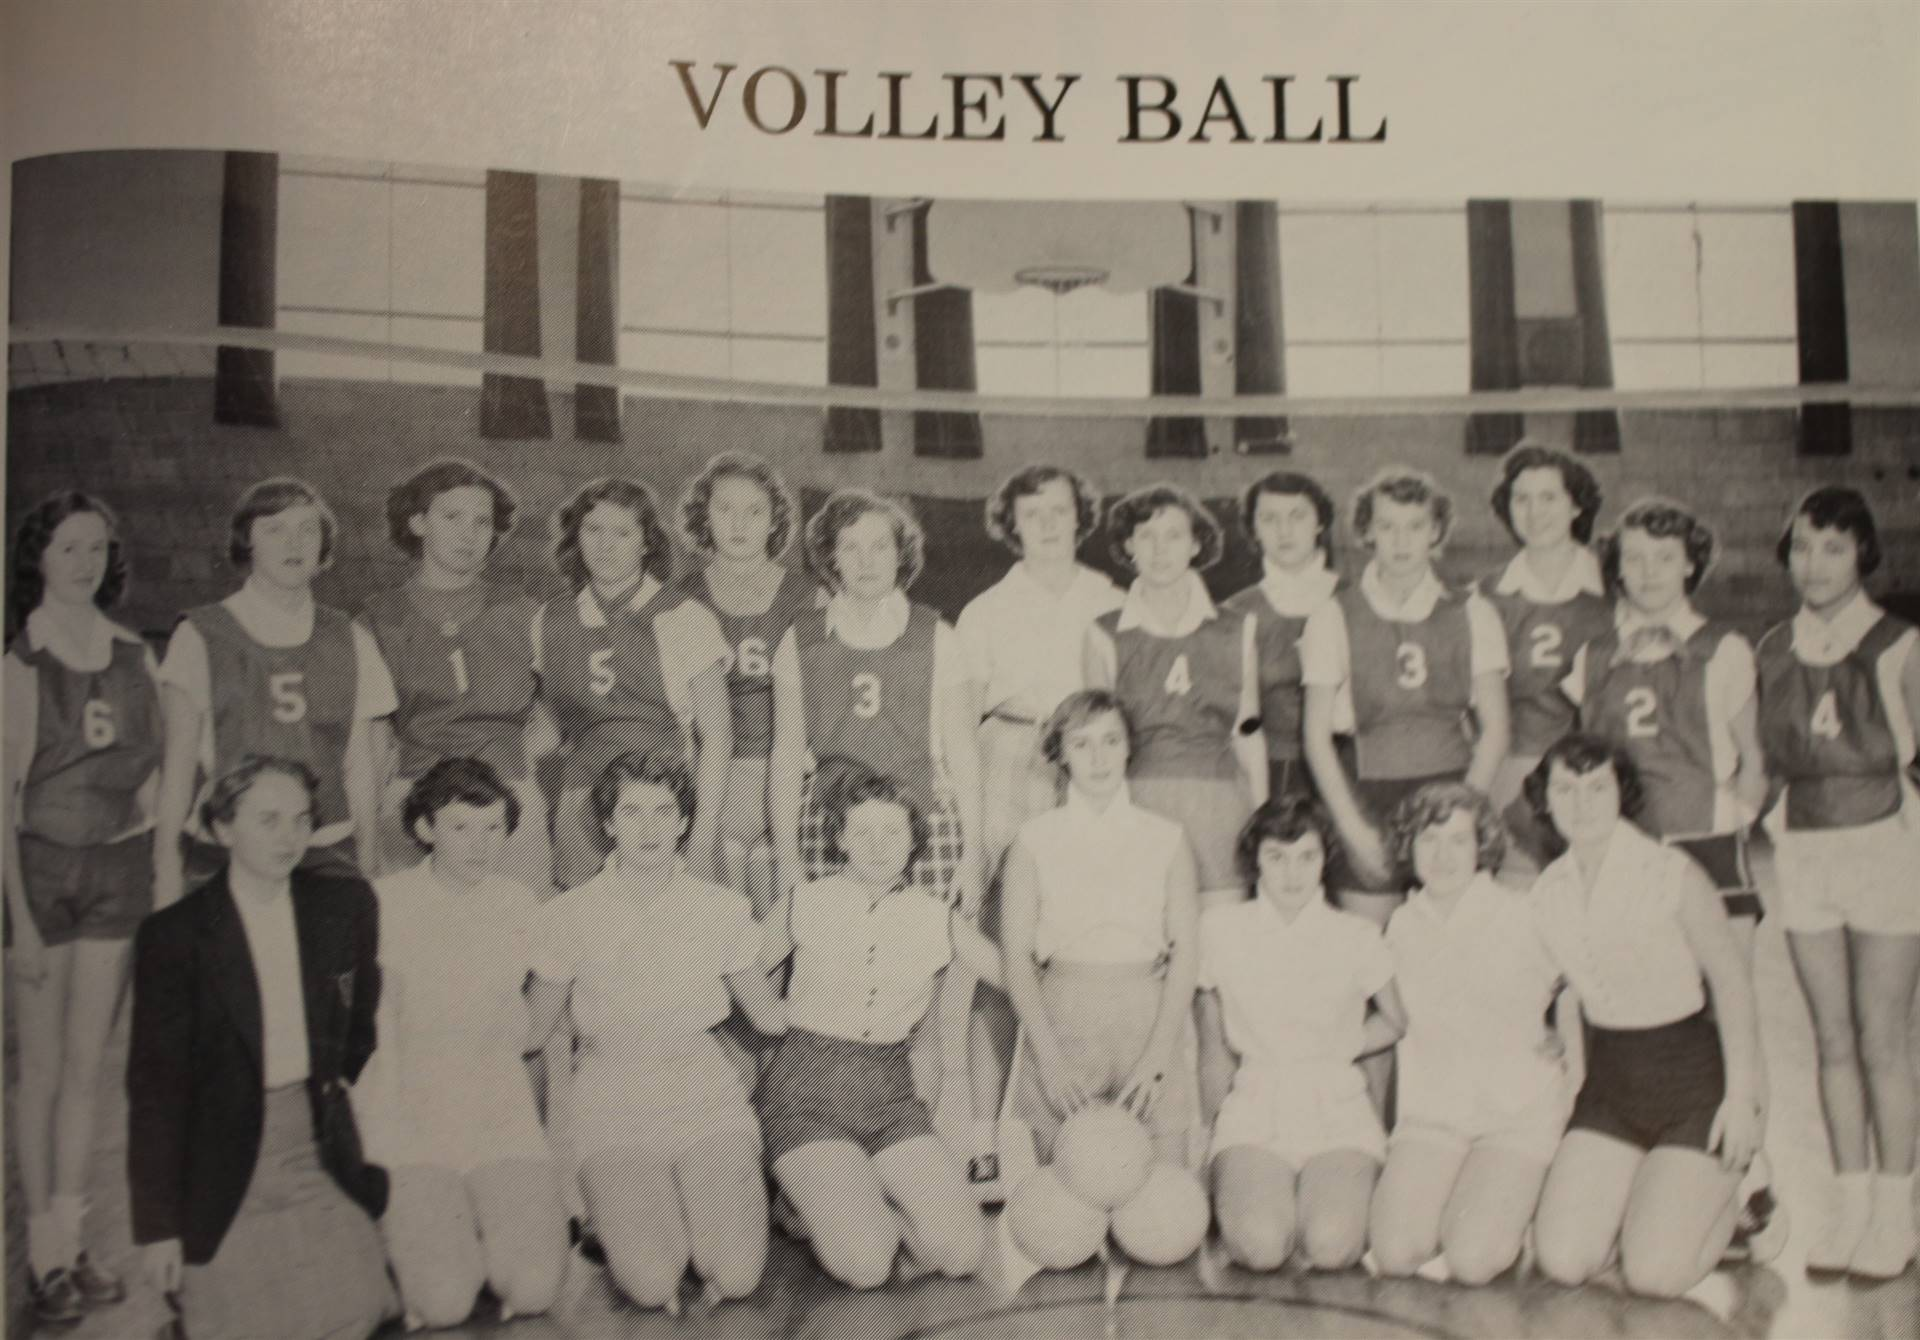 1954 Volleyball